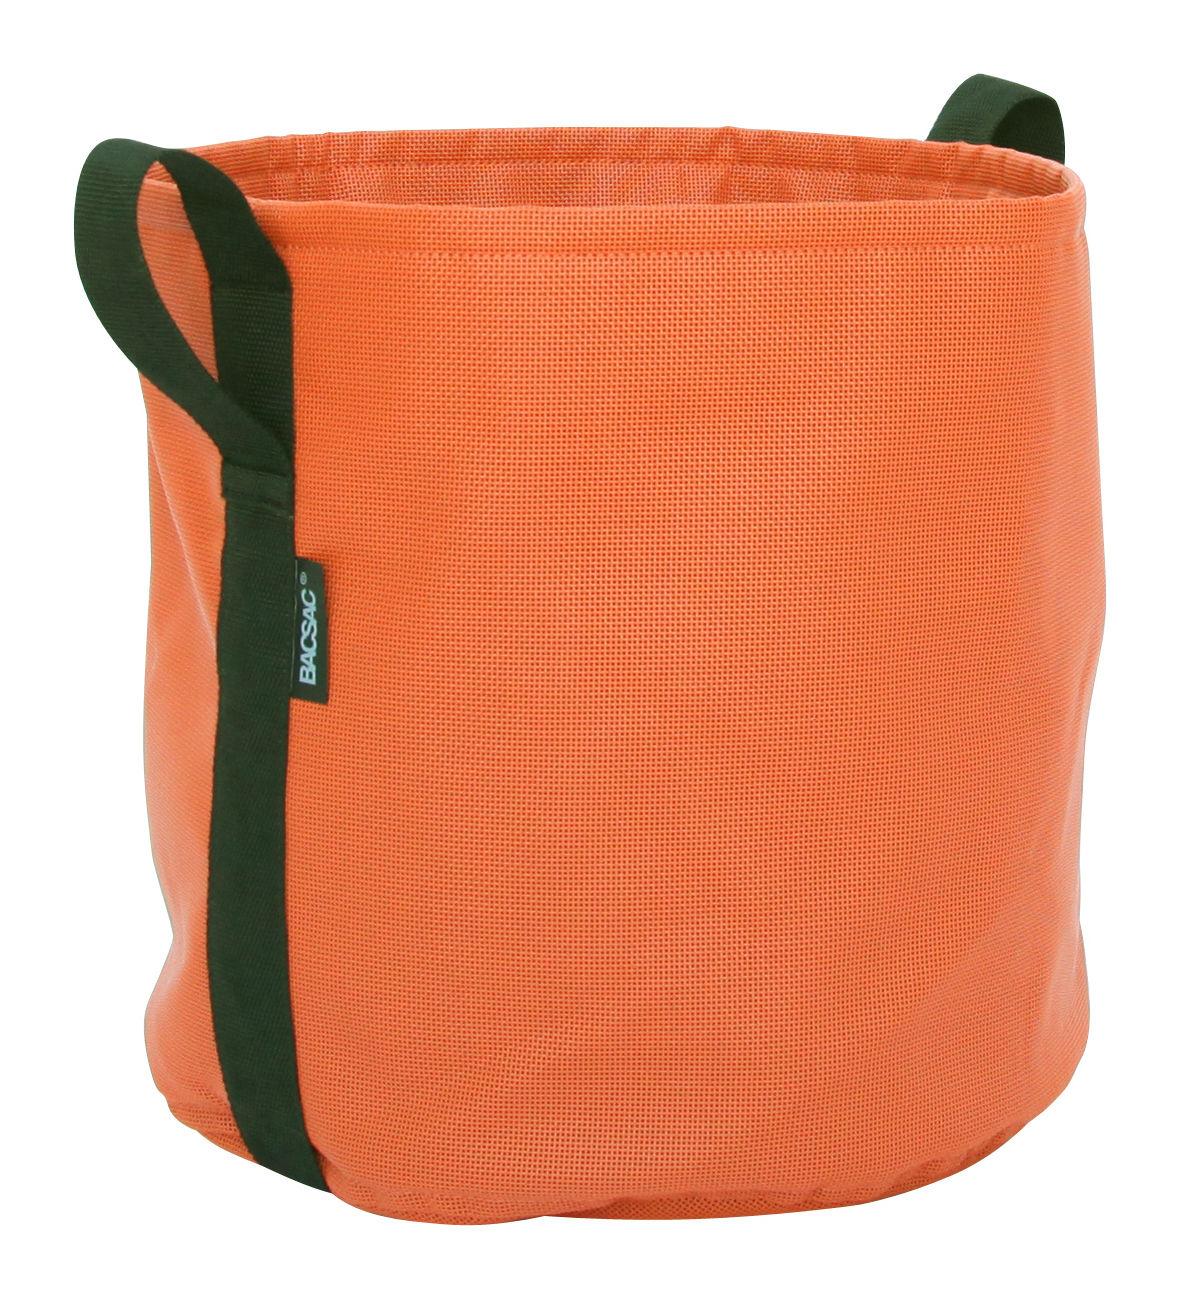 Outdoor - Pots & Plants - Batyline® Flowerpot - Outdoor - 25 L by Bacsac - Pumpkin - Batyline® fabric